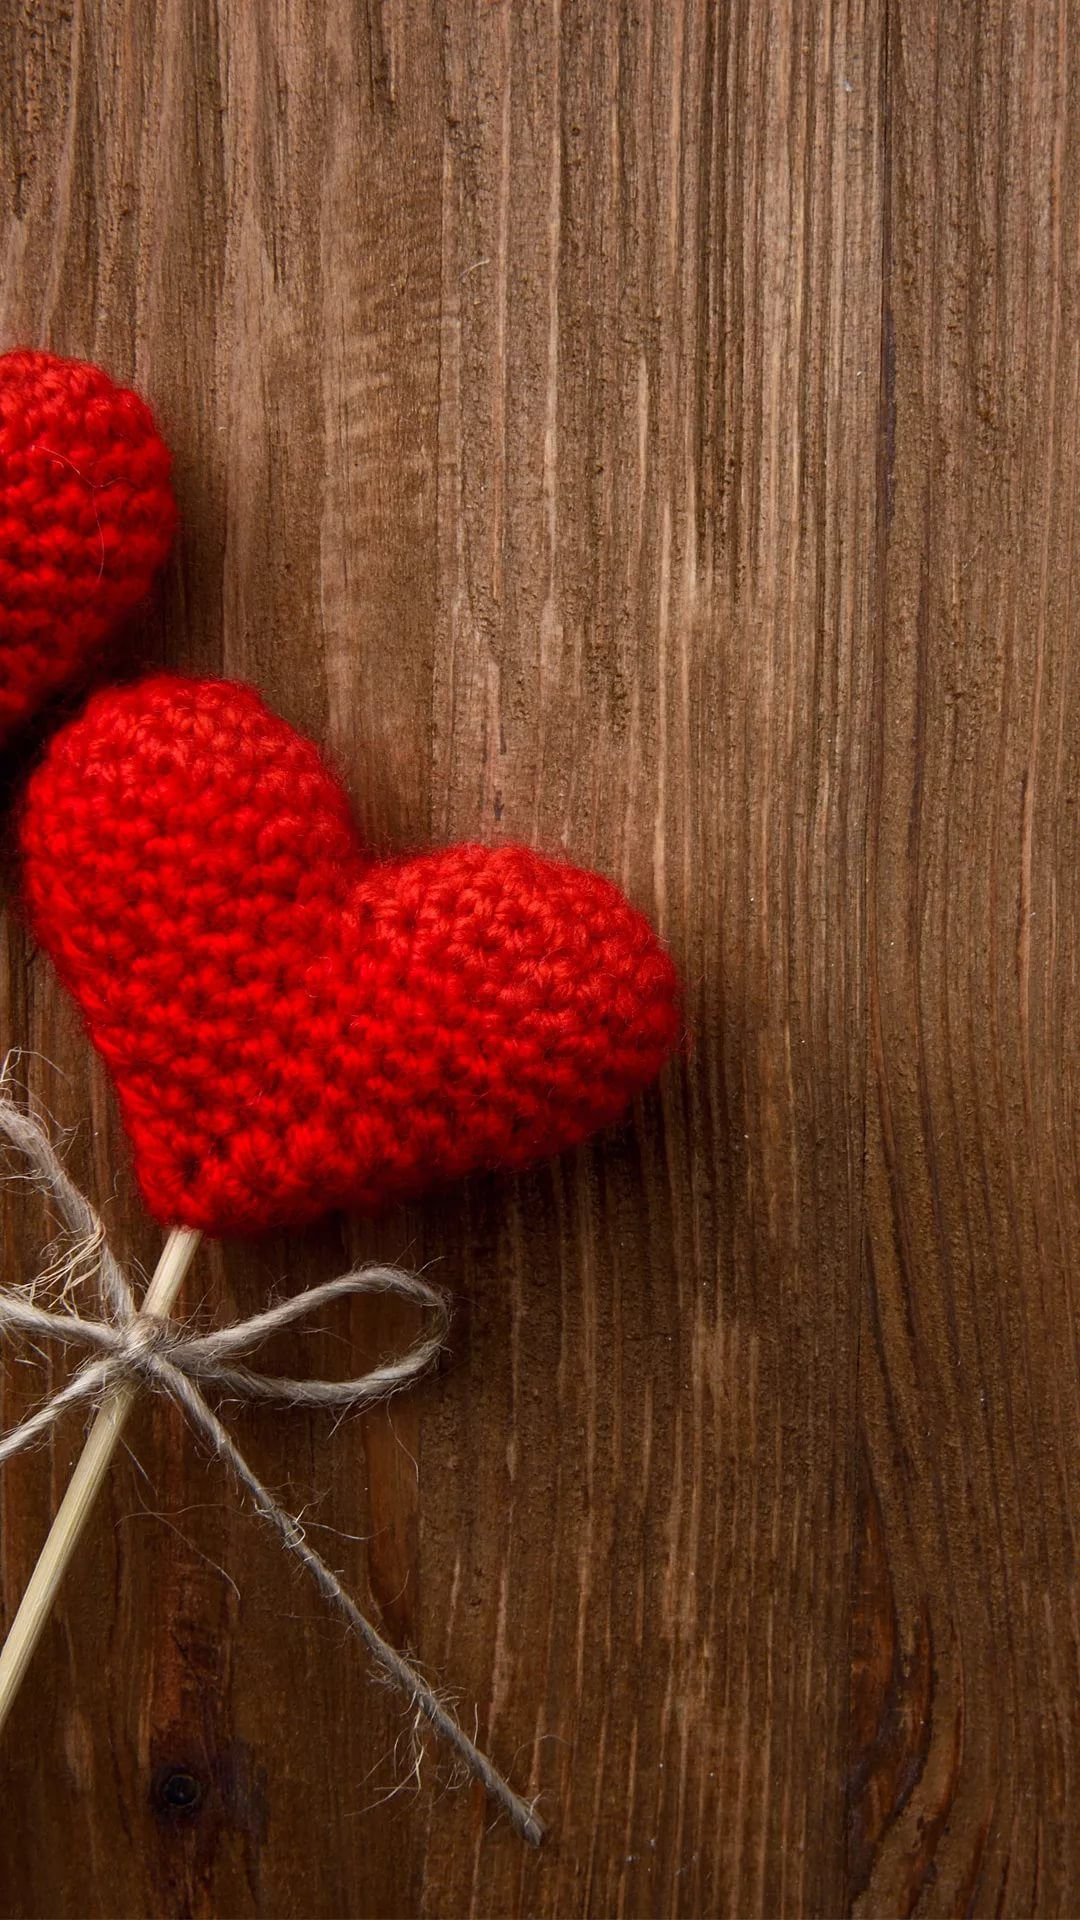 Cute Love screen saver wallpaper